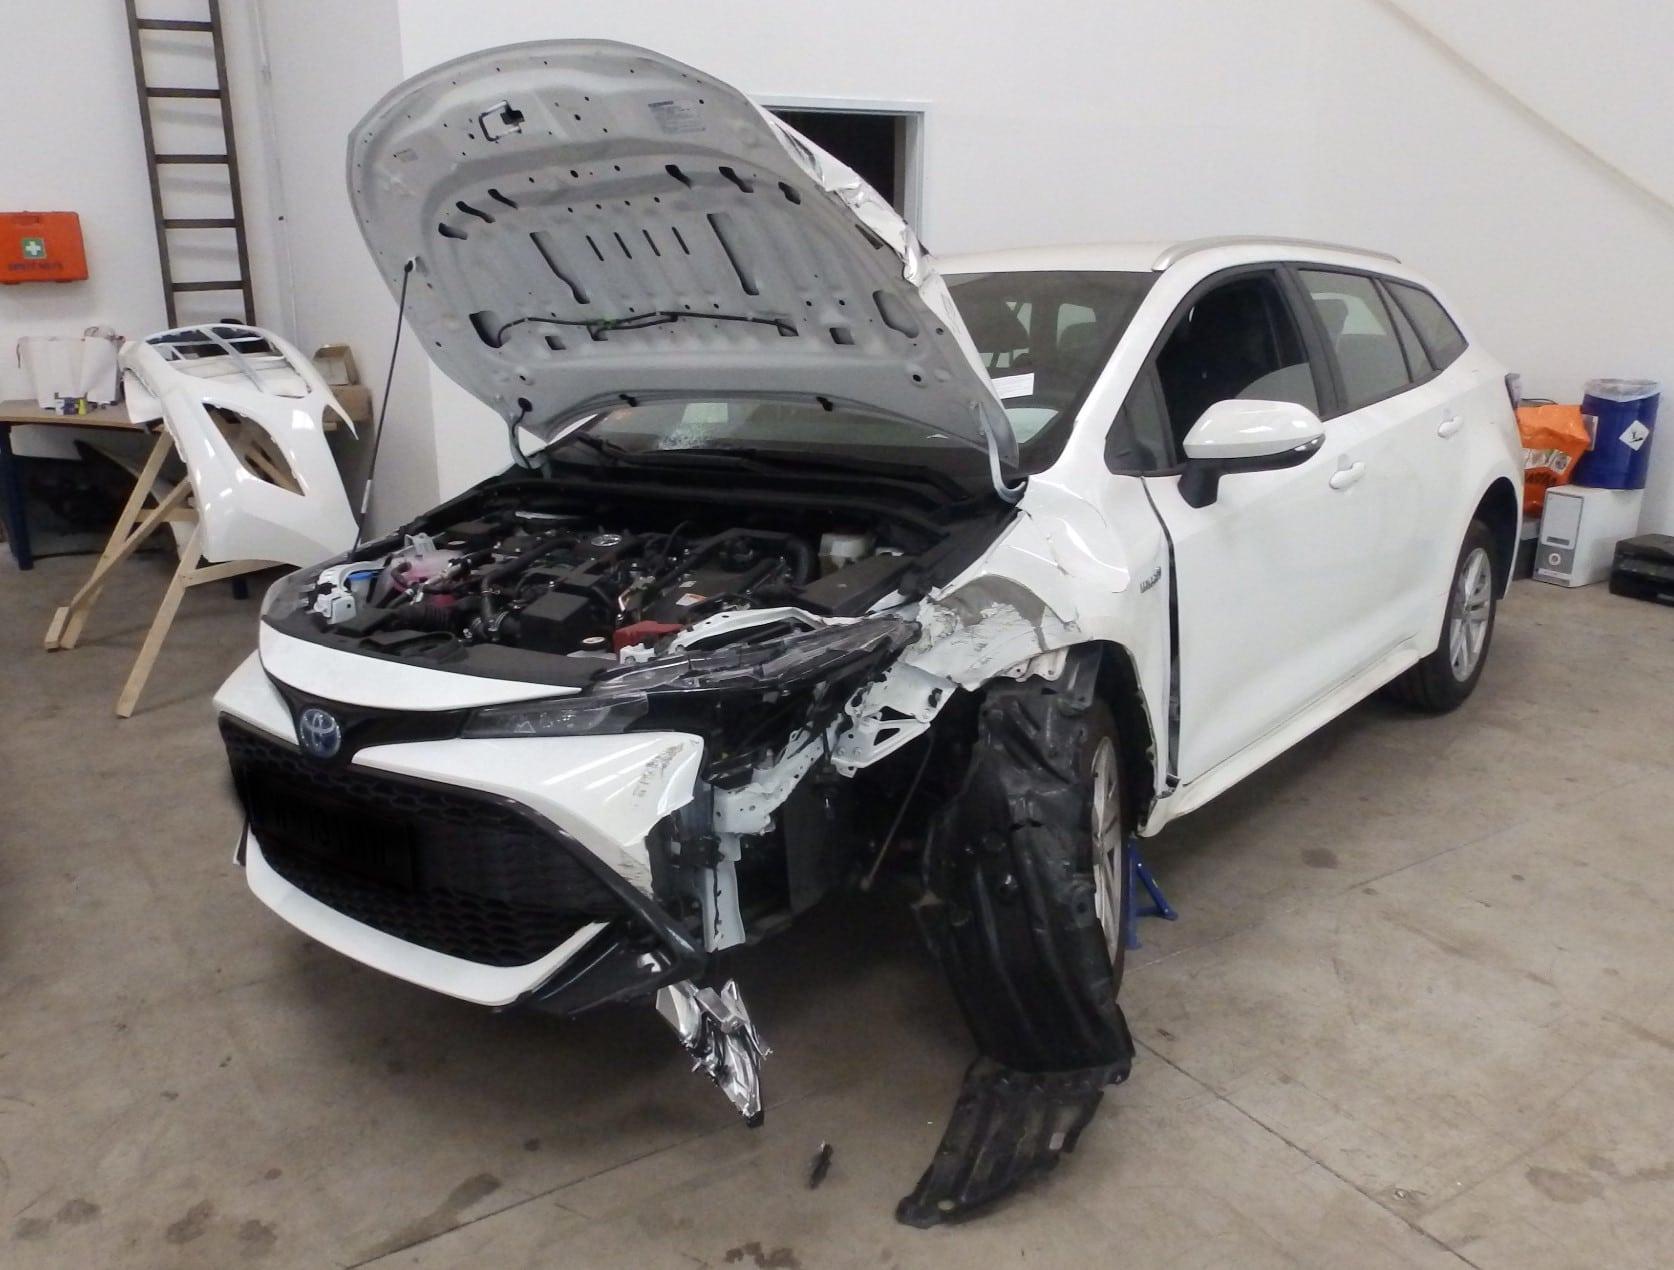 Toyota Corolla разбилась